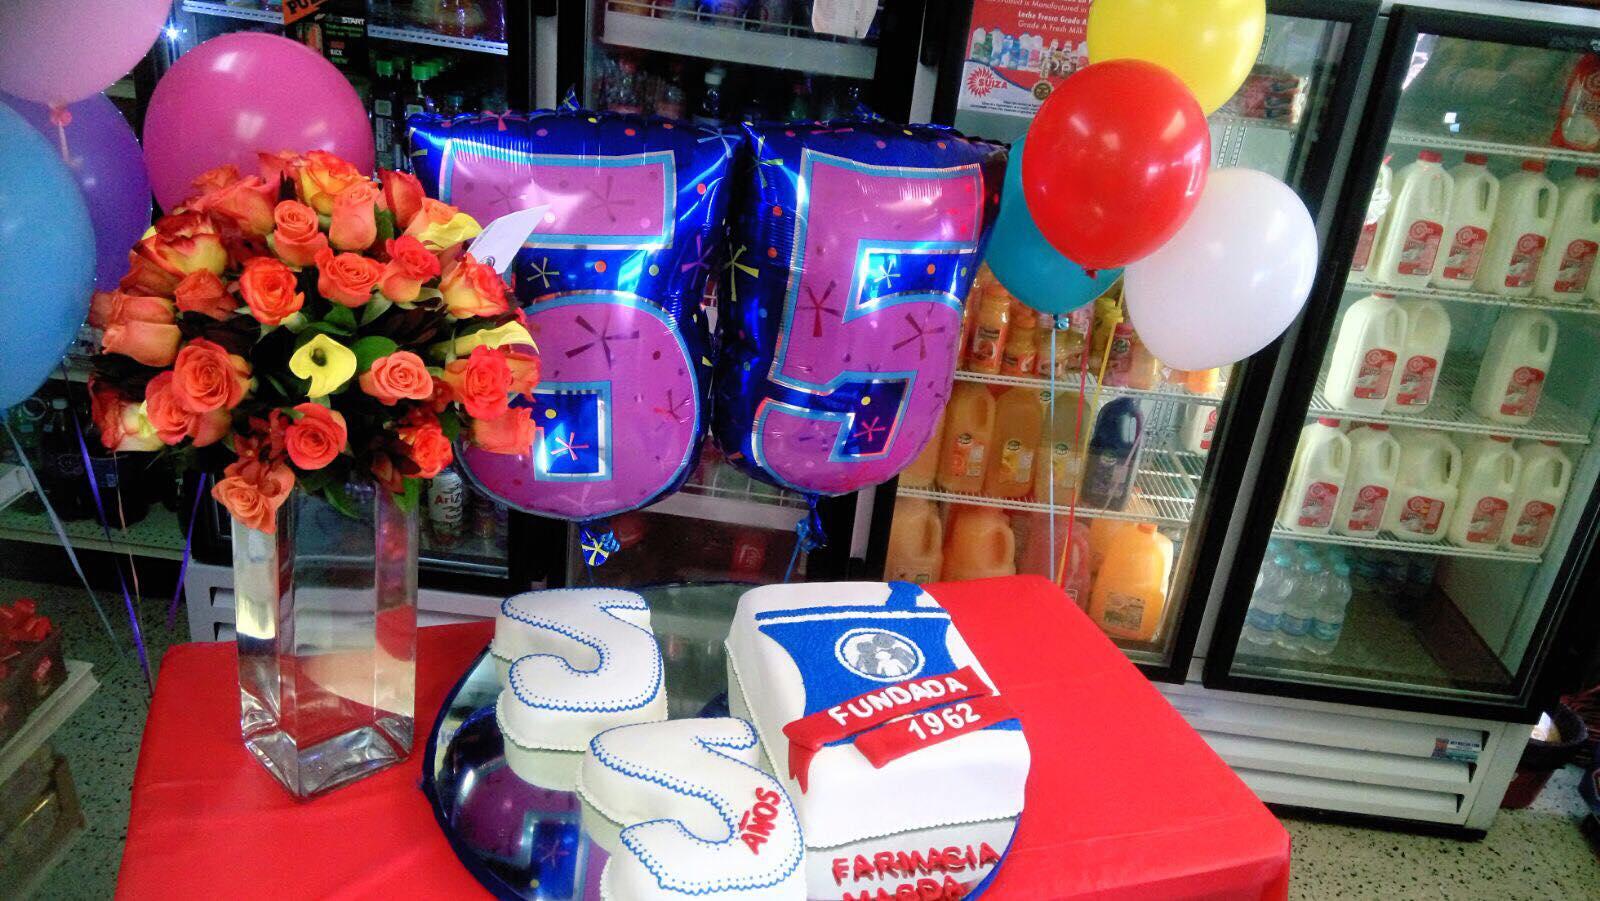 Farmacia Magda Celebra sus 55 Aniversario